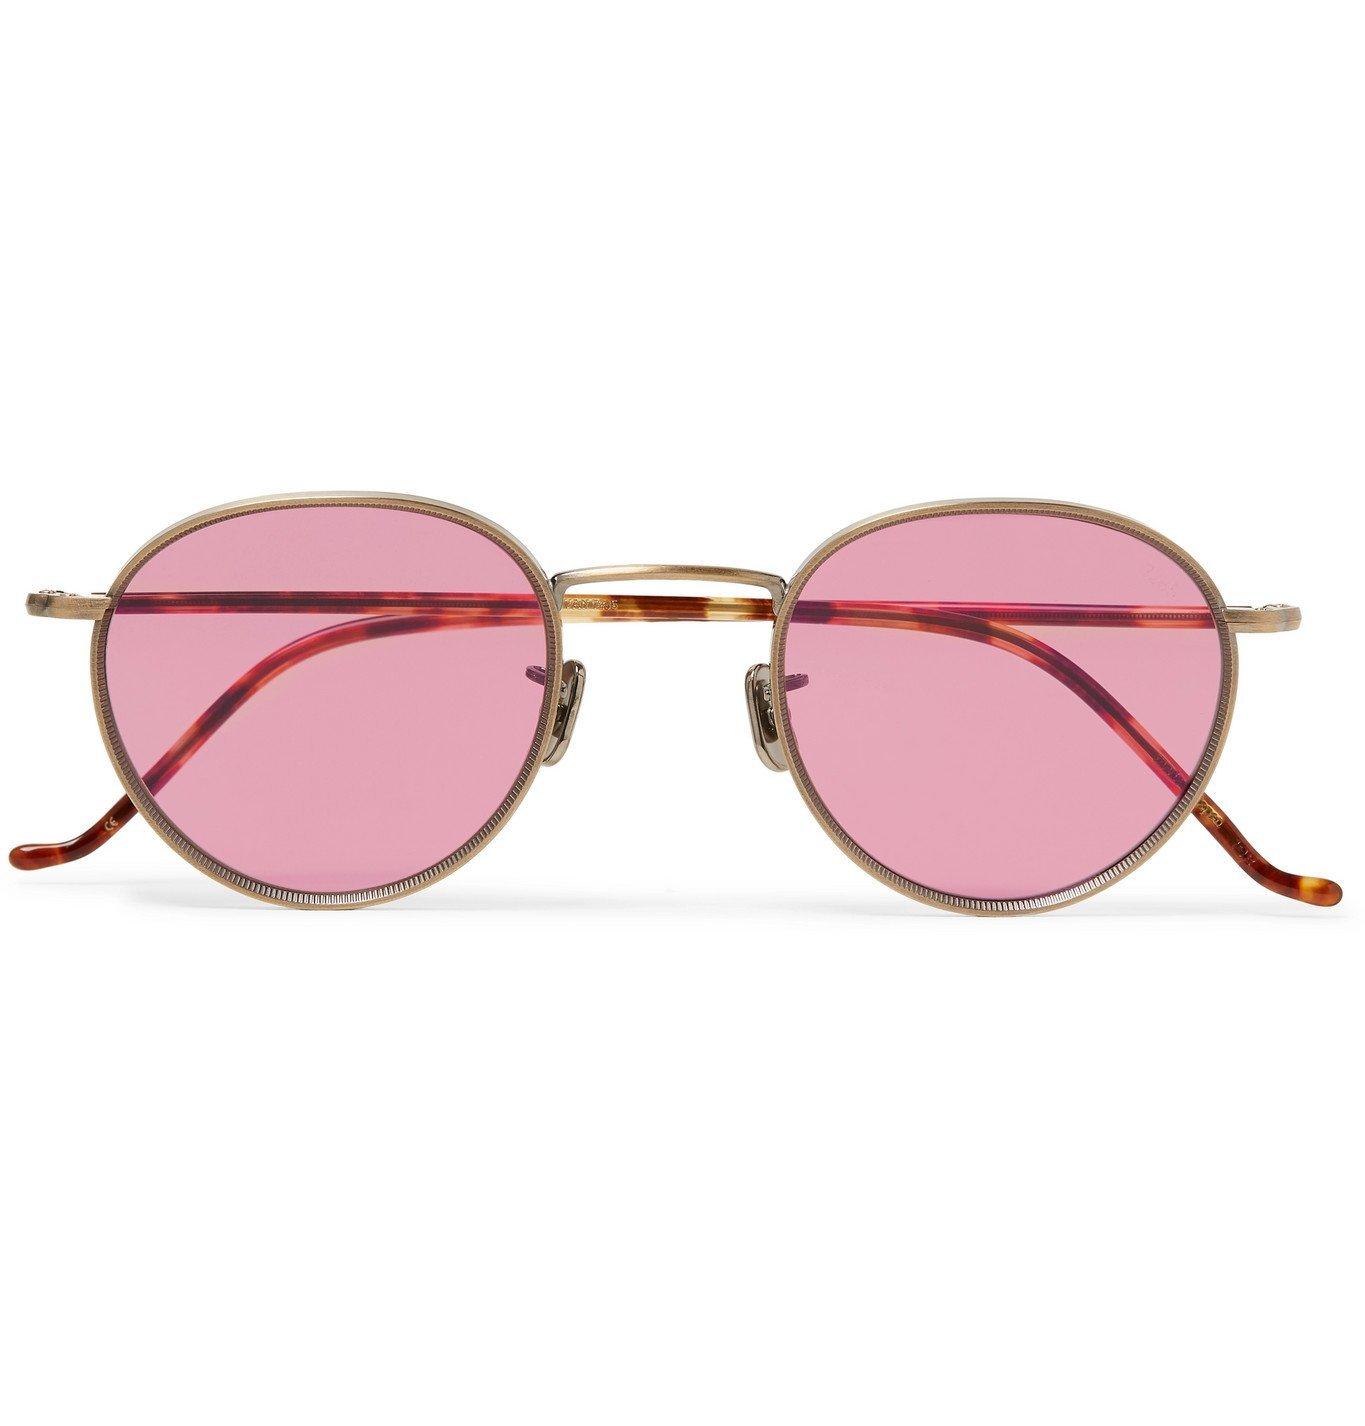 Photo: Eyevan 7285 - Round-Frame Gold-Tone Titanium and Tortoiseshell Acetate Sunglasses - Gold